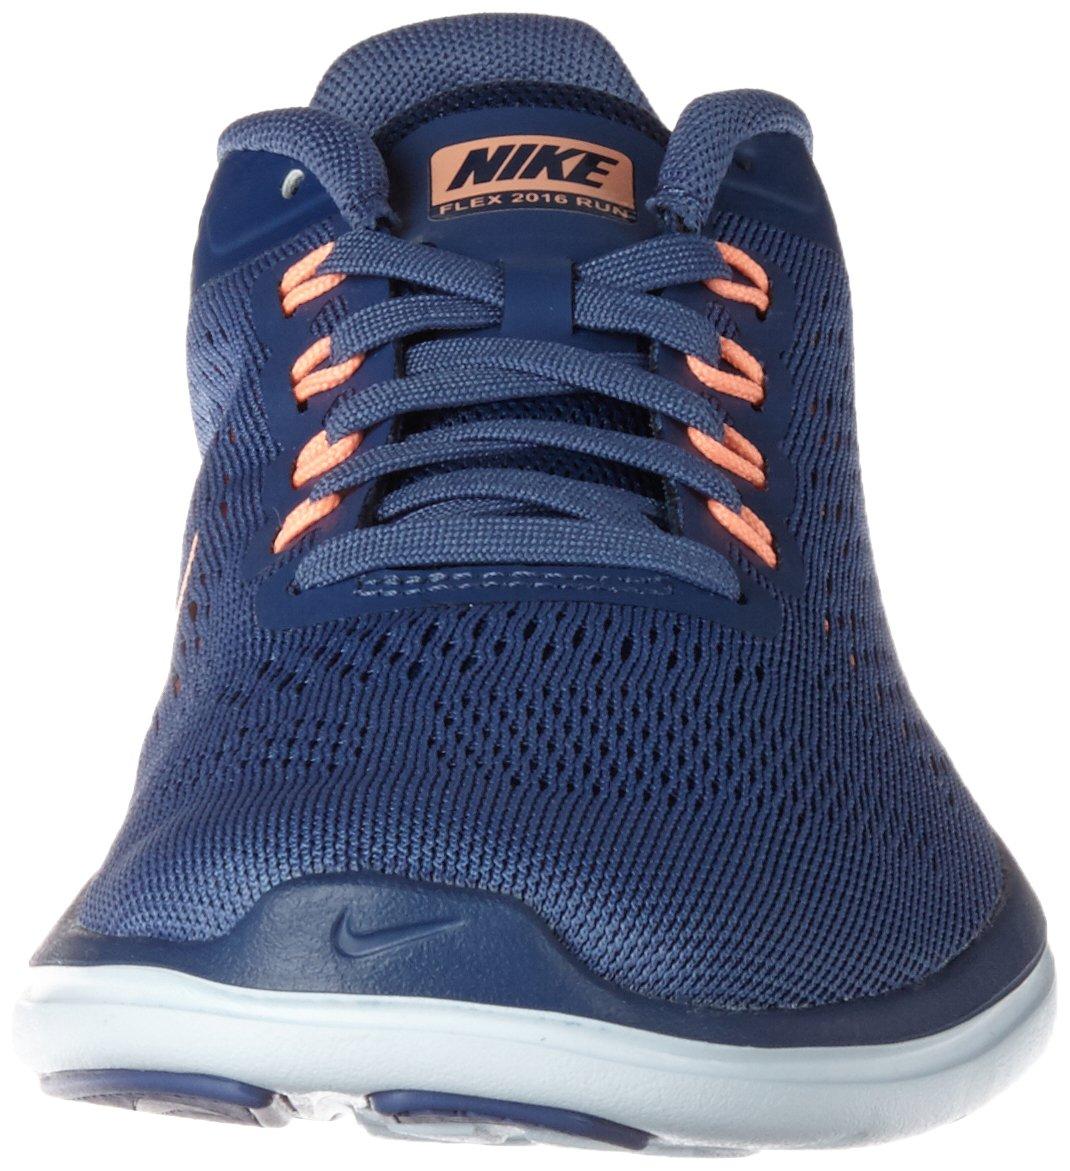 NIKE Women's Flex 2016 Rn B(M) Running Shoes B01H4XCU1M 6.5 B(M) Rn US|Blue Moon/Sunset Glow/Coastal Blue f5e1f6